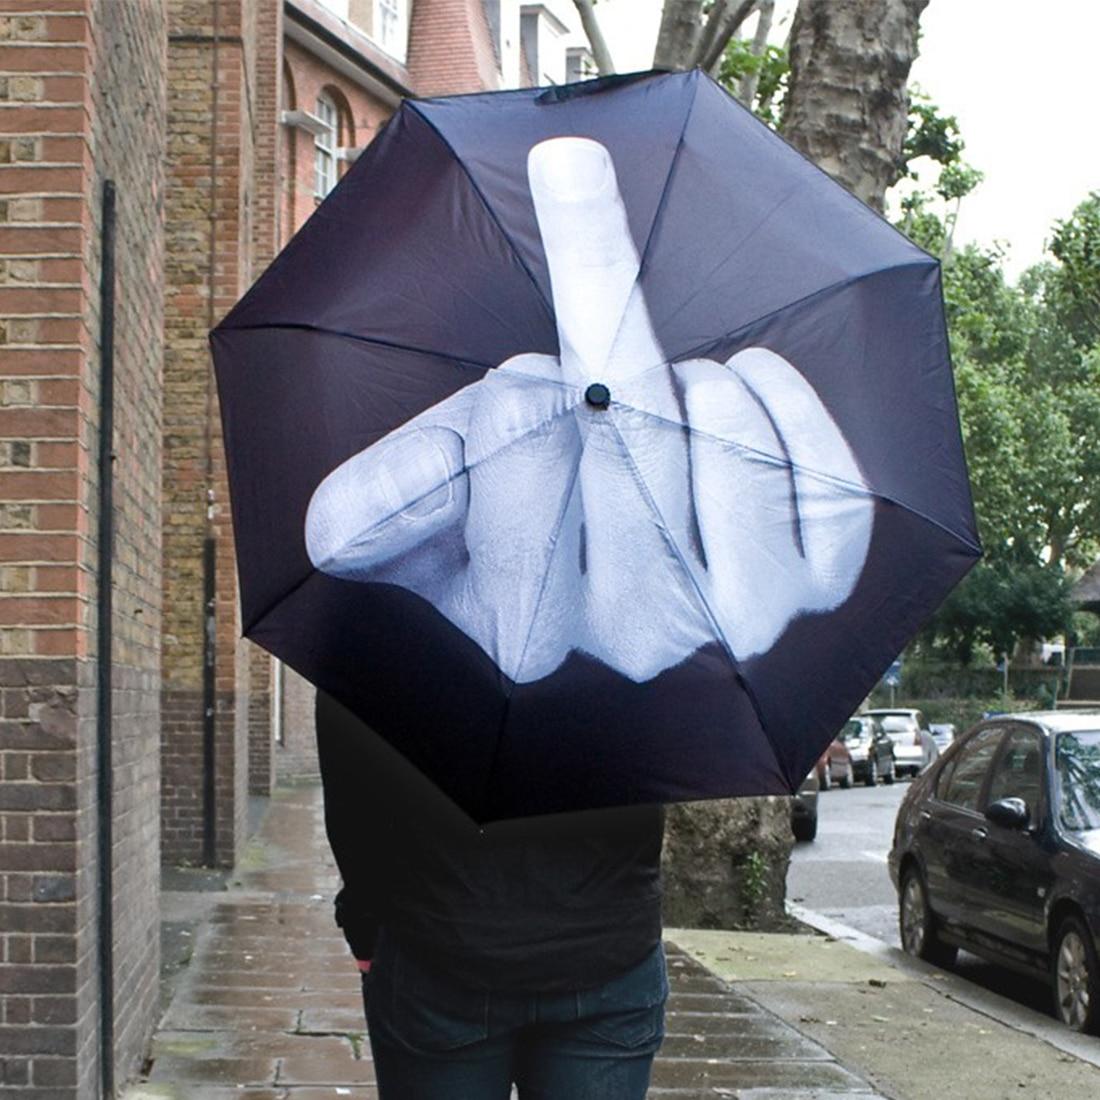 2016 Hot Sale Novelty Middle <font><b>Finger</b></font> Design Black Umbrella Cool Fashion Impact Umbrella 3 Fold Convinience High Quality Umbrella